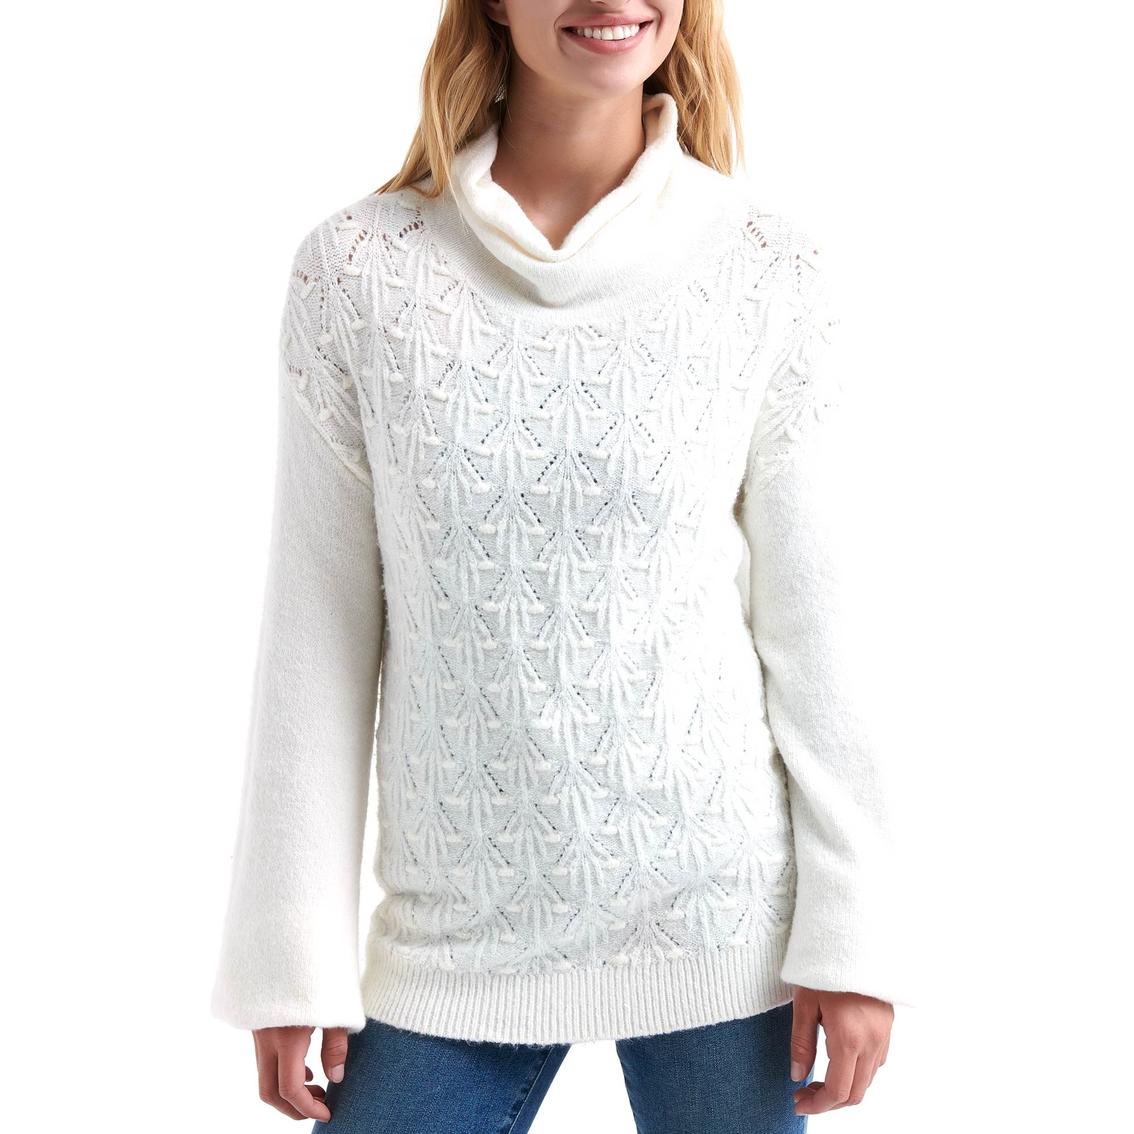 Brand TurtleneckSweaters Shop Pointelle Apparel The Lucky fY7ybgv6